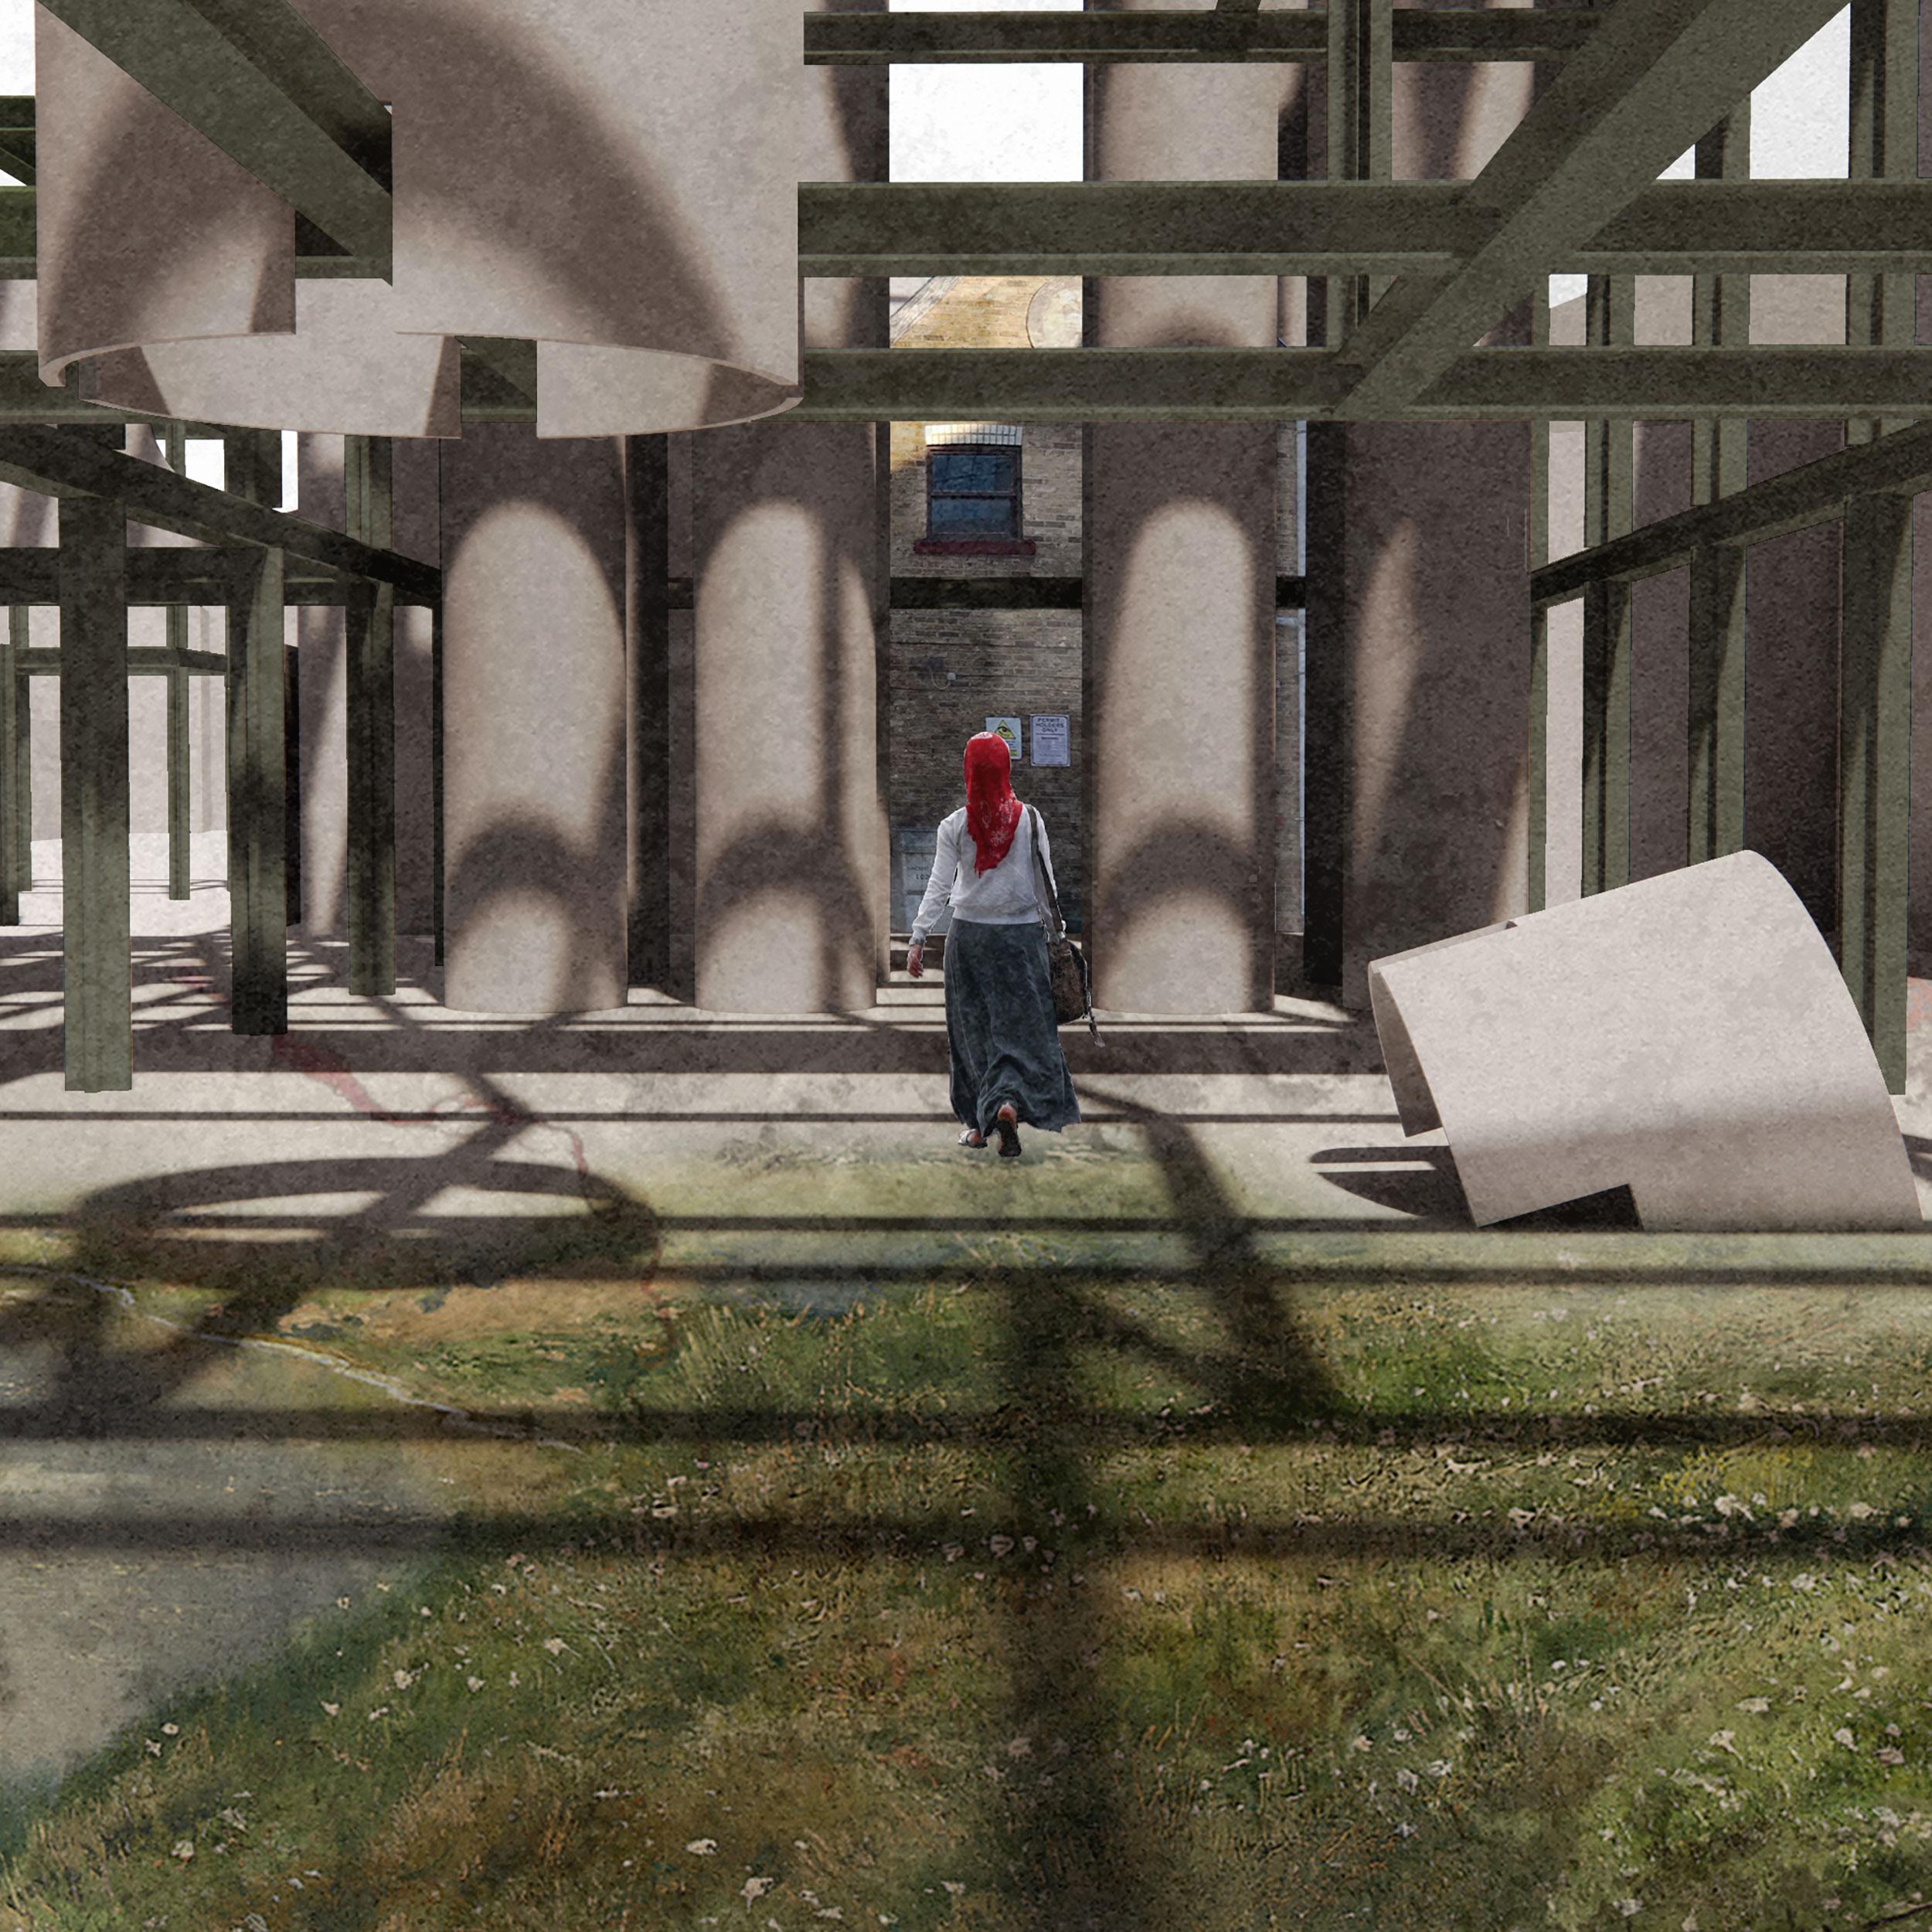 2100: memorial gardens